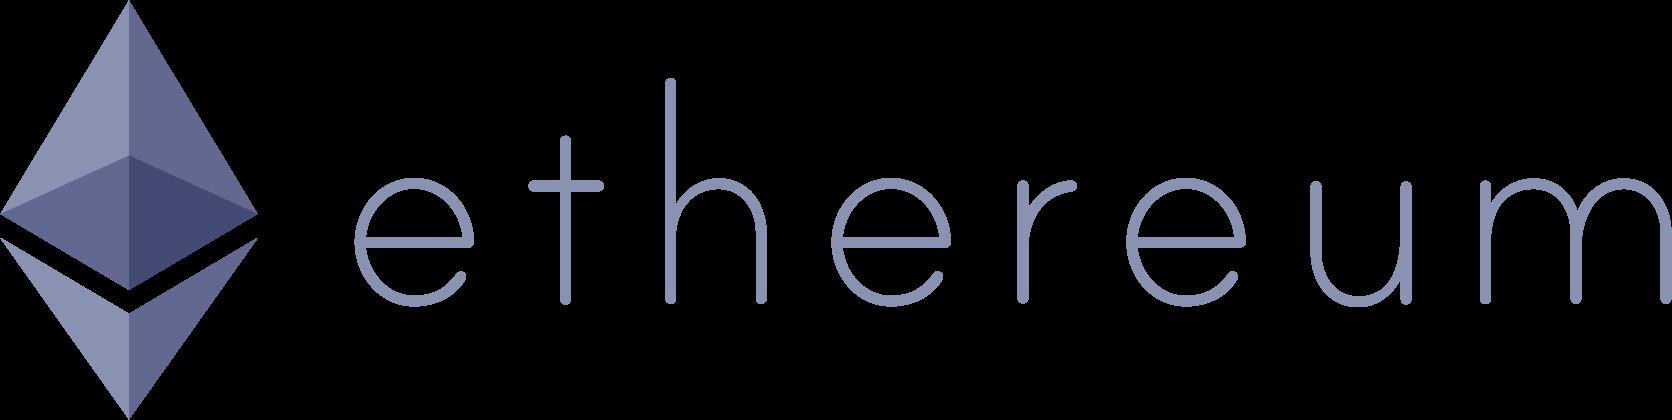 ethereum-(eth)